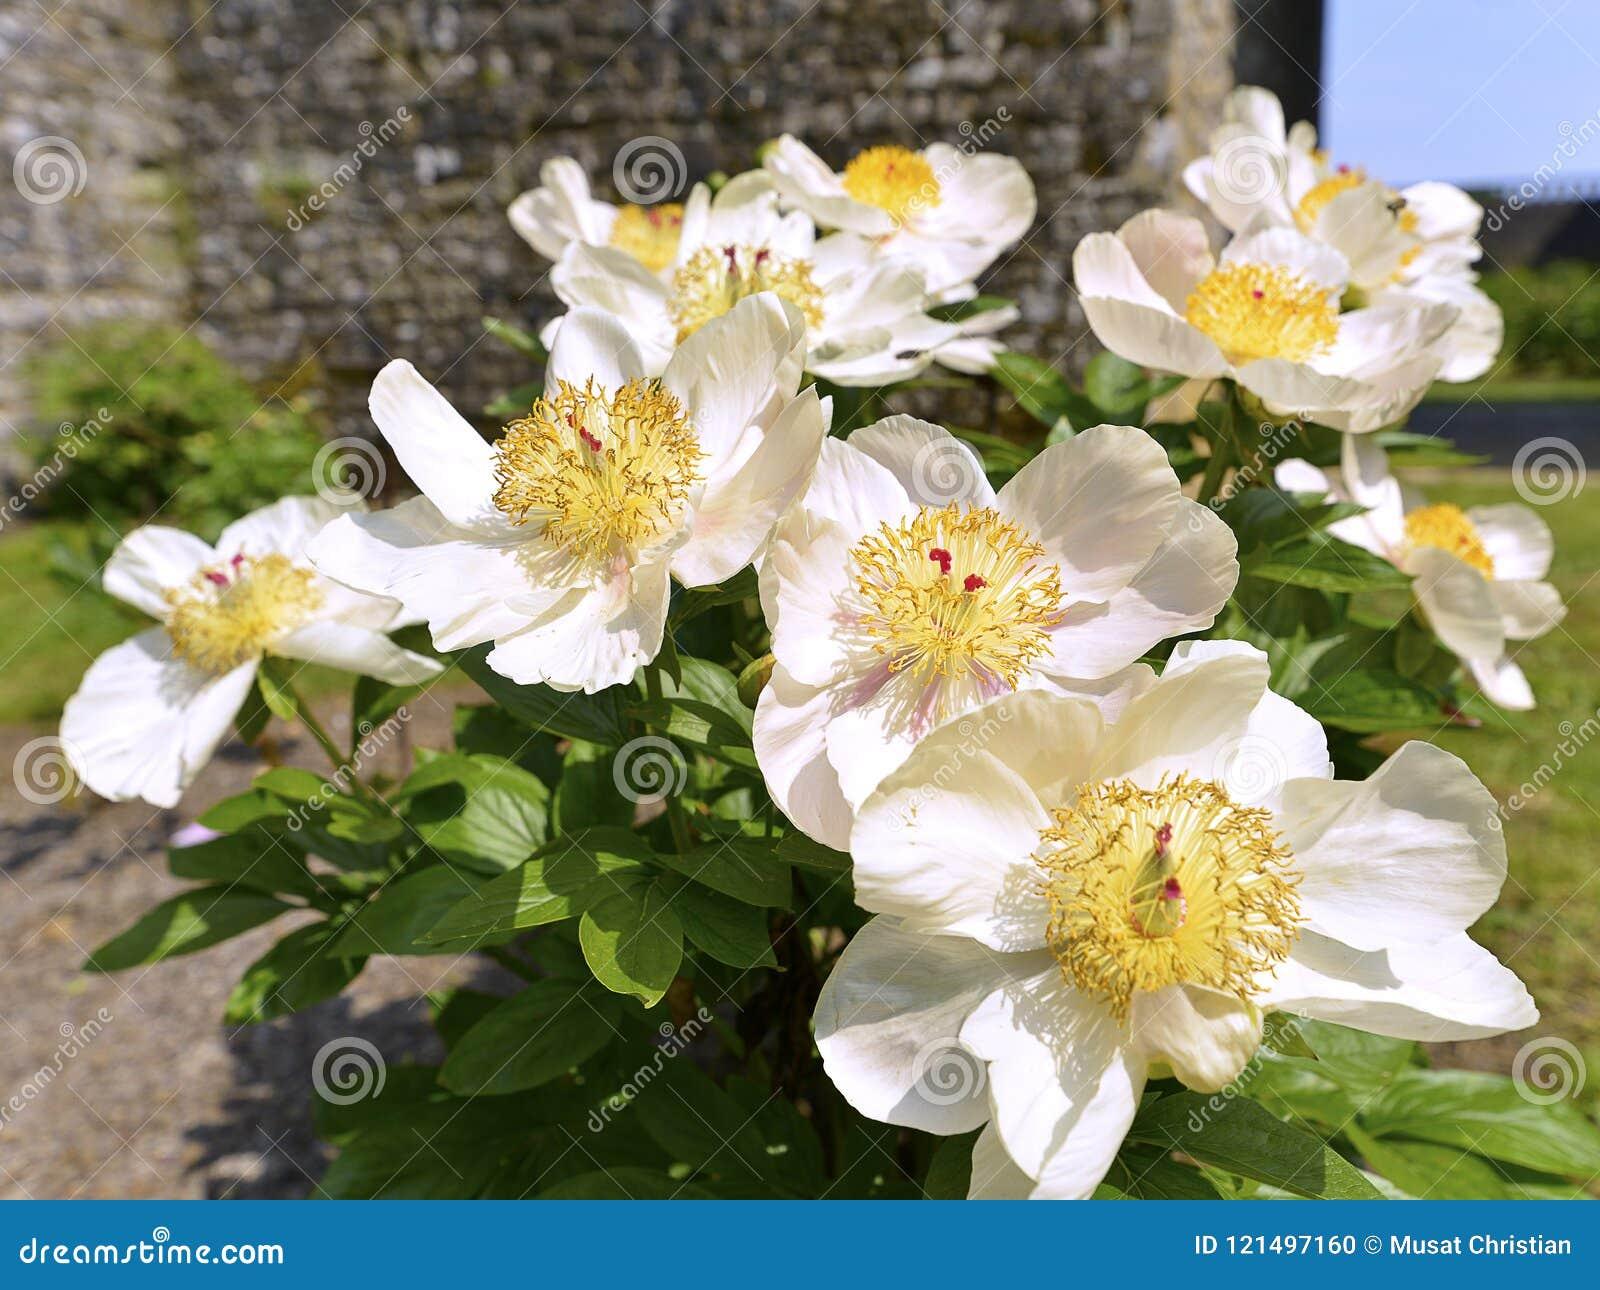 White Chinese Peonies Flowers Stock Photo Image Of Paeoniaceae